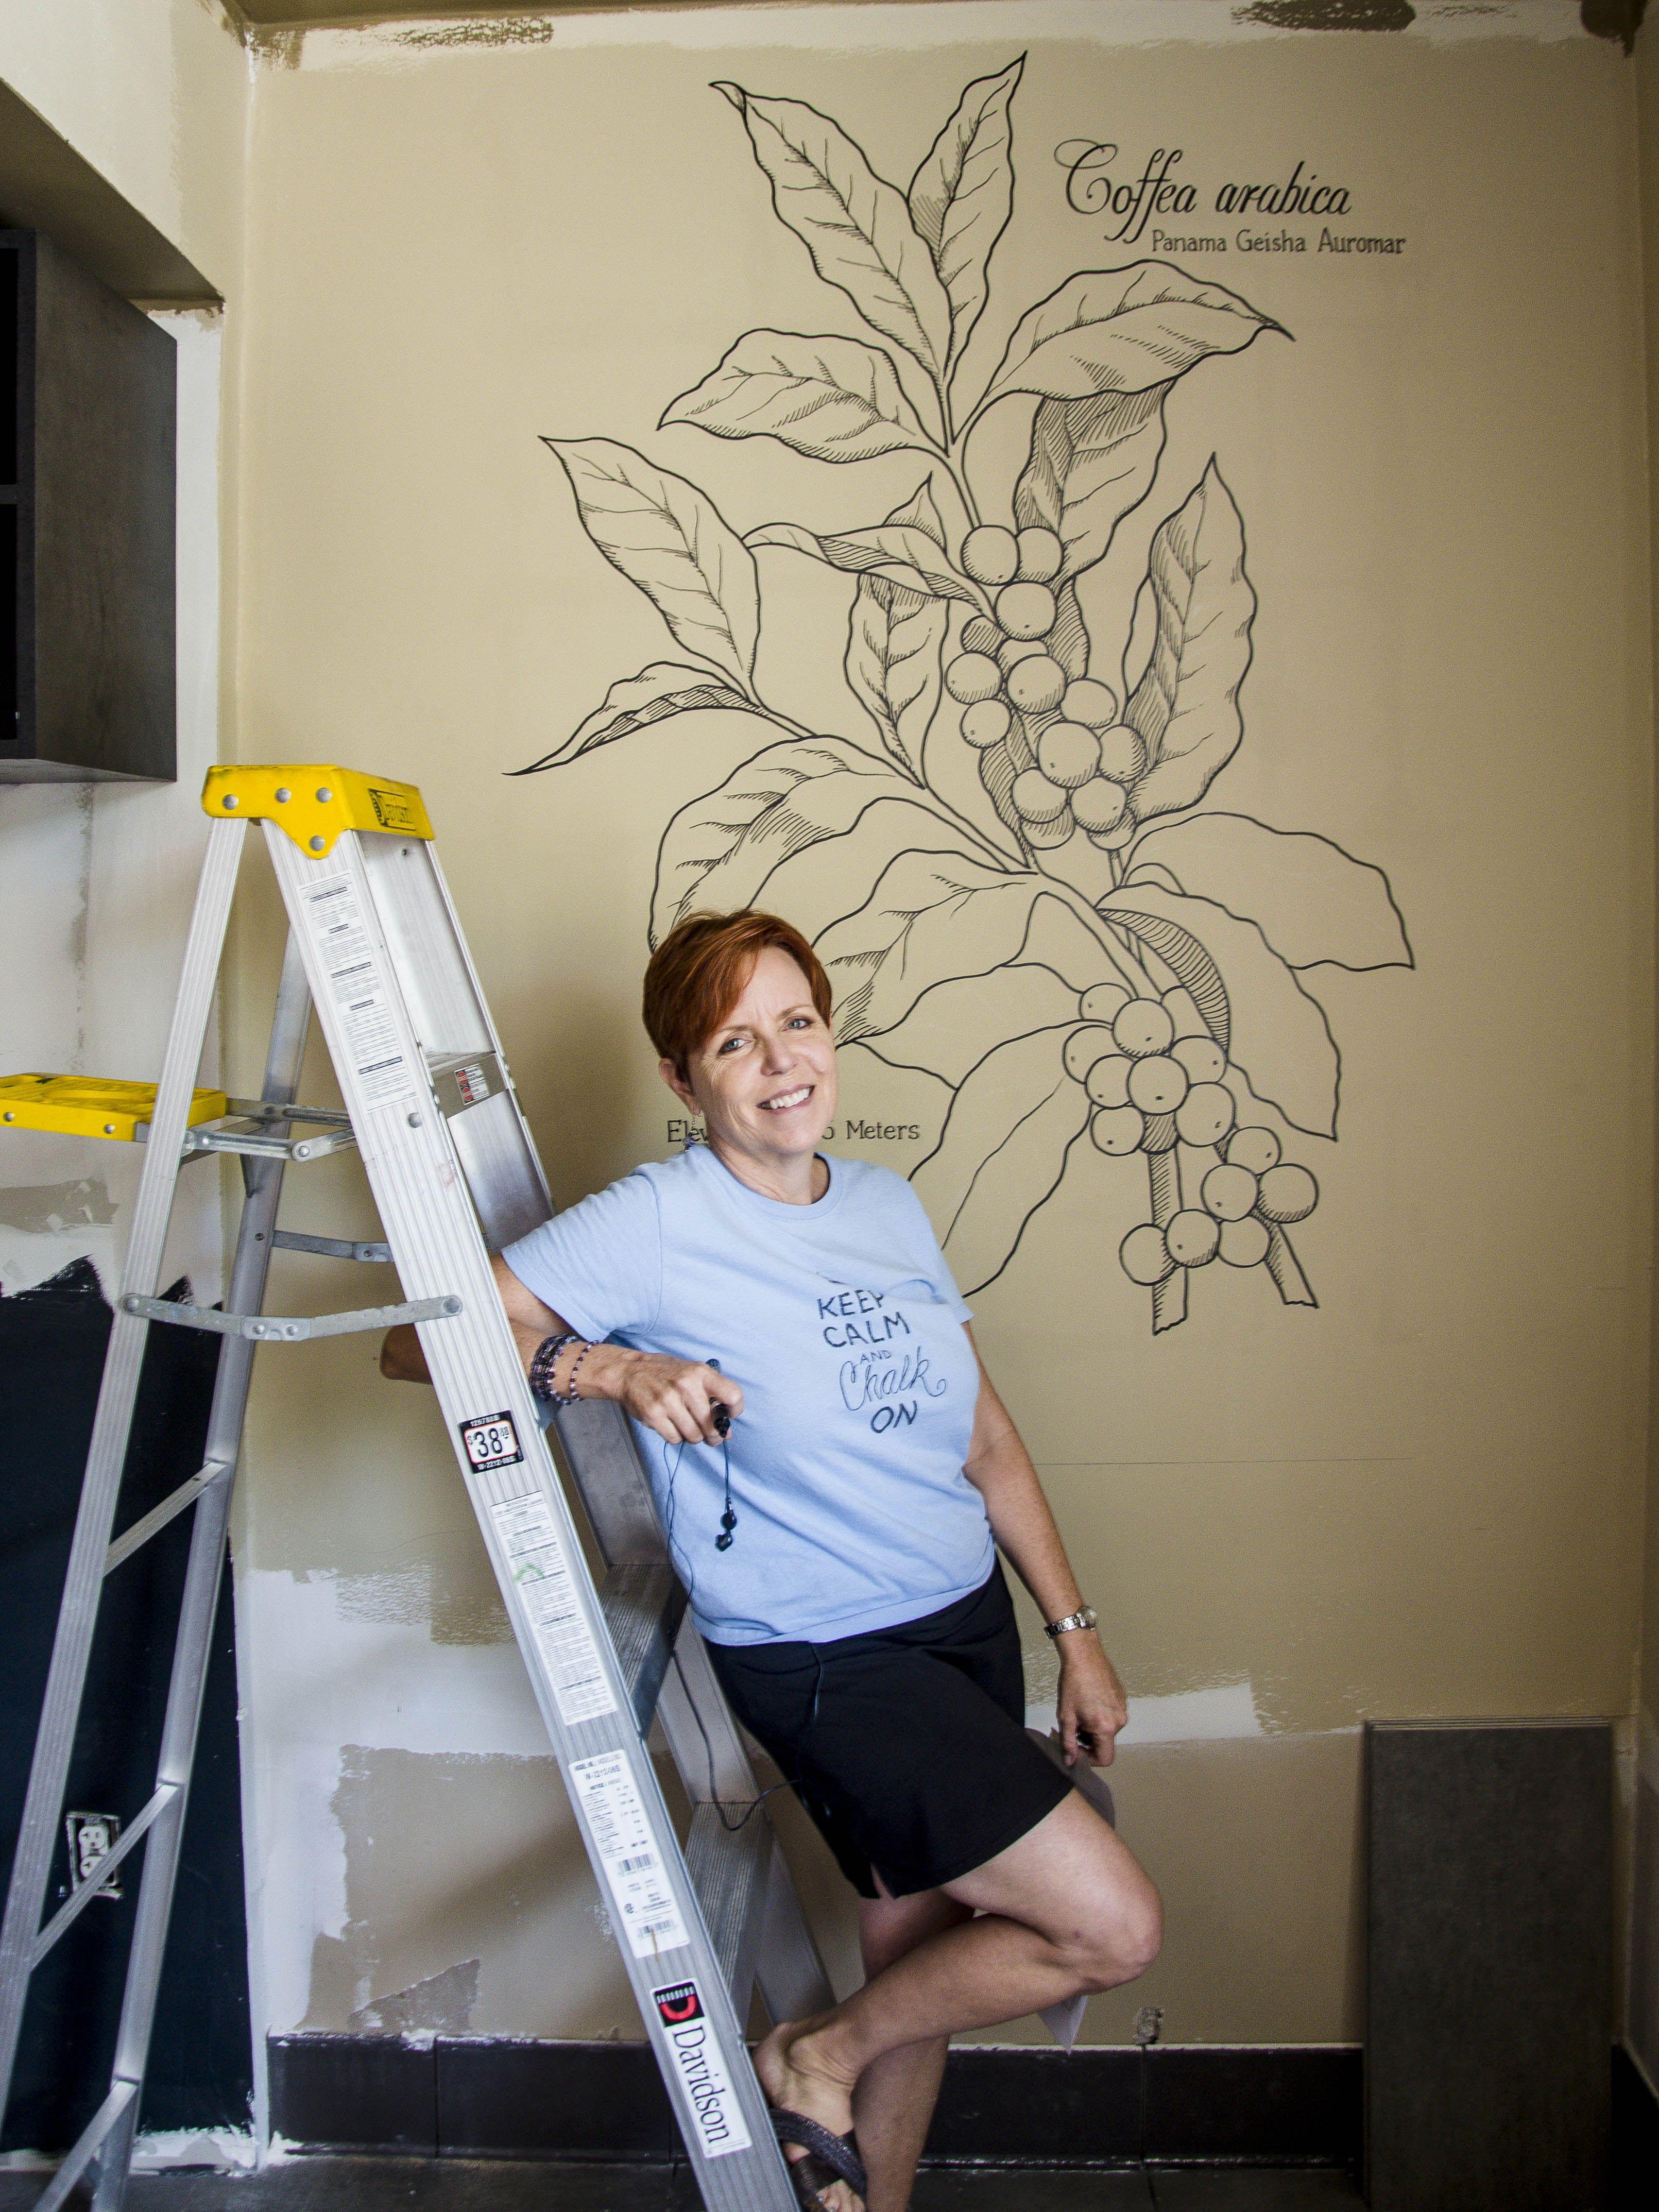 Car Paint Store >> Black paint on wall #starbucks #coffee #mural # ...